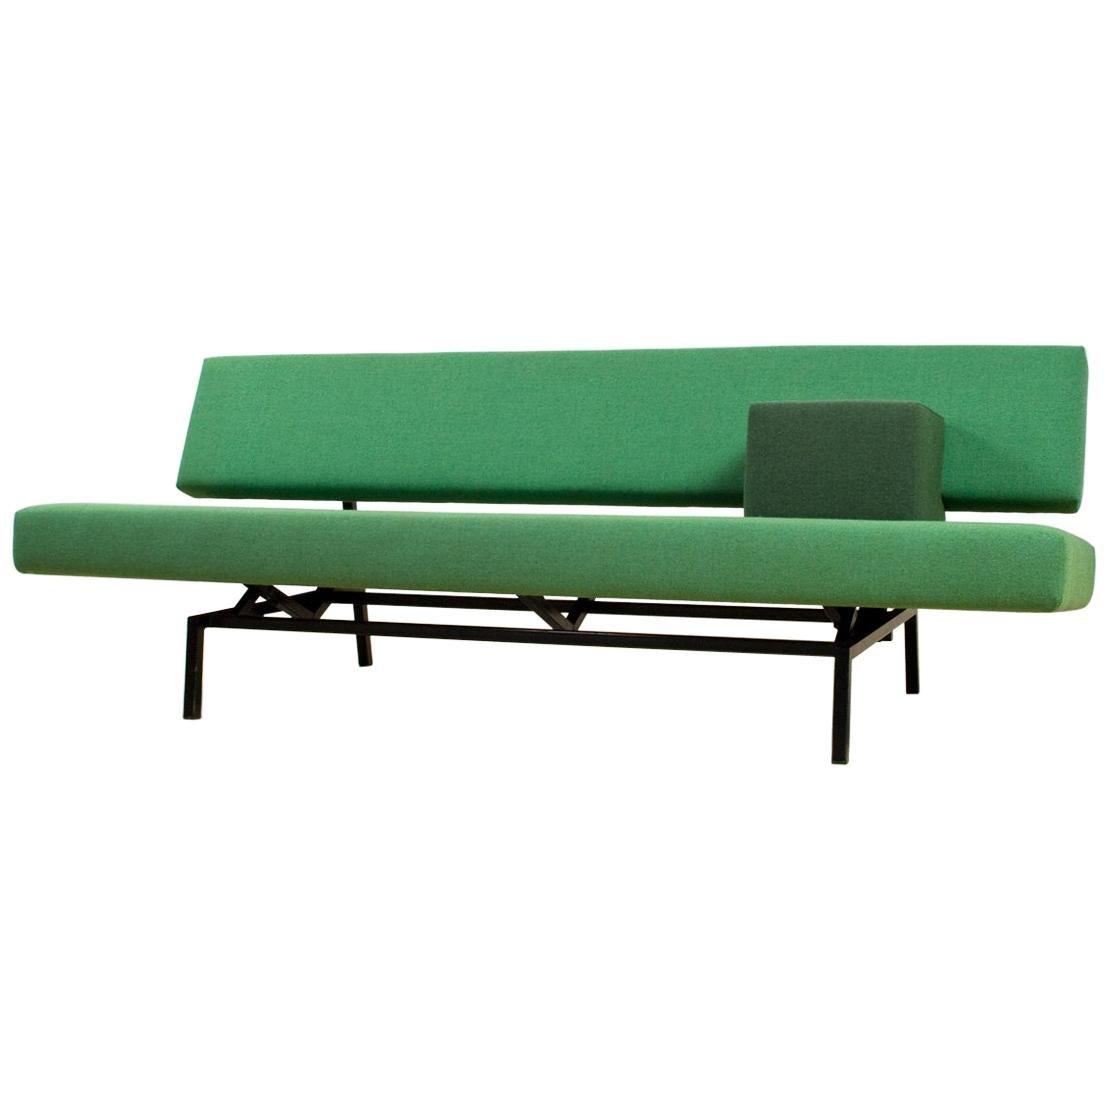 Mid Century Modern Sofa Daybed In Forest Green By Martin Visser, Spectrum,  1960s